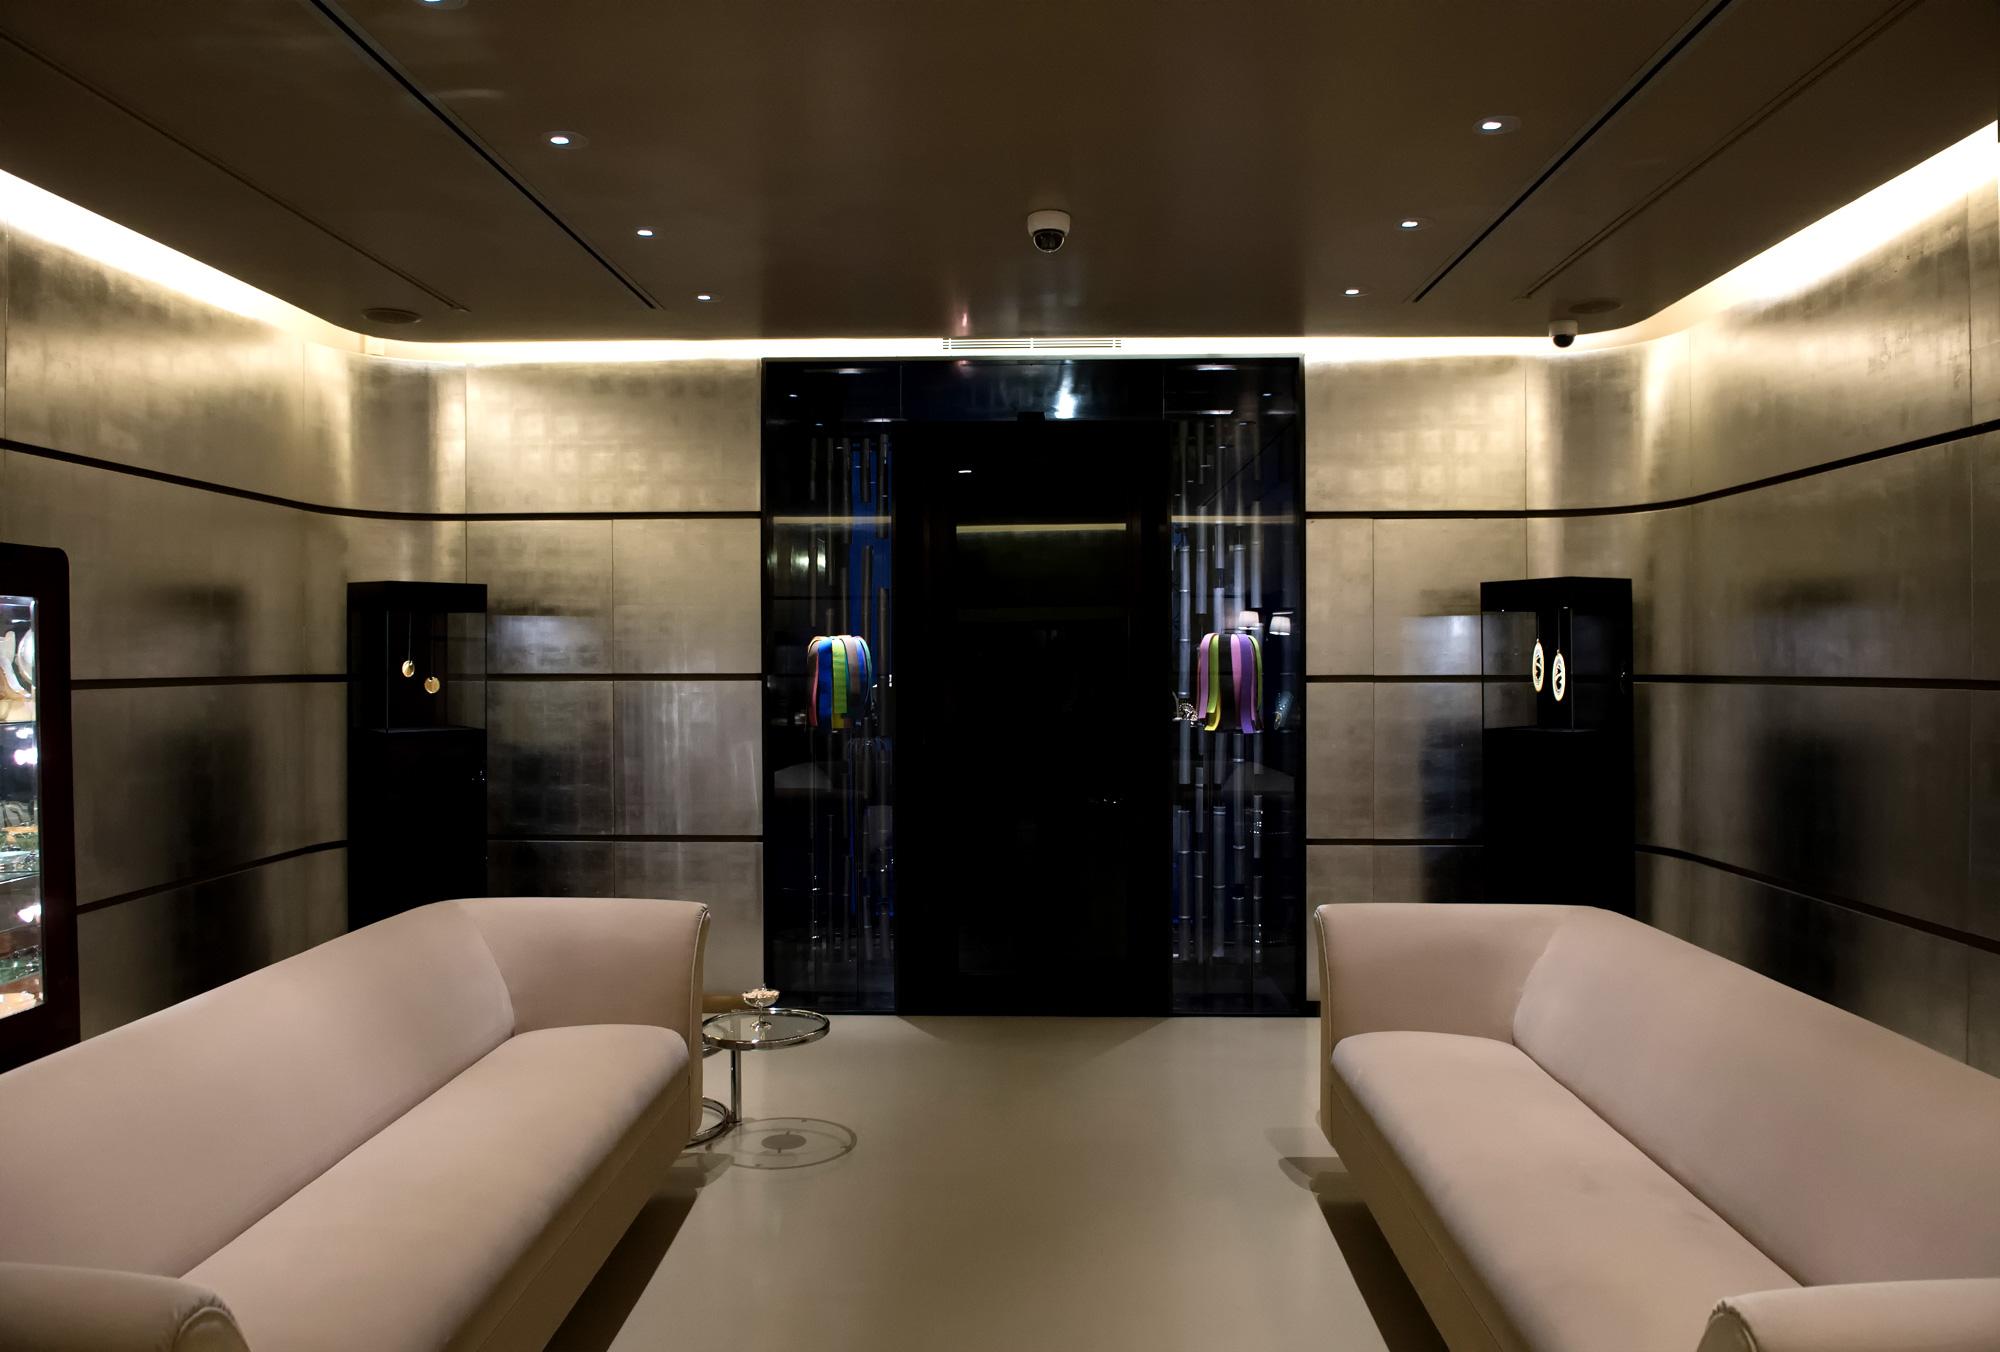 Bevilacqua Architects – Dangerous Luxury of Campana Brothers and Fabio Salini